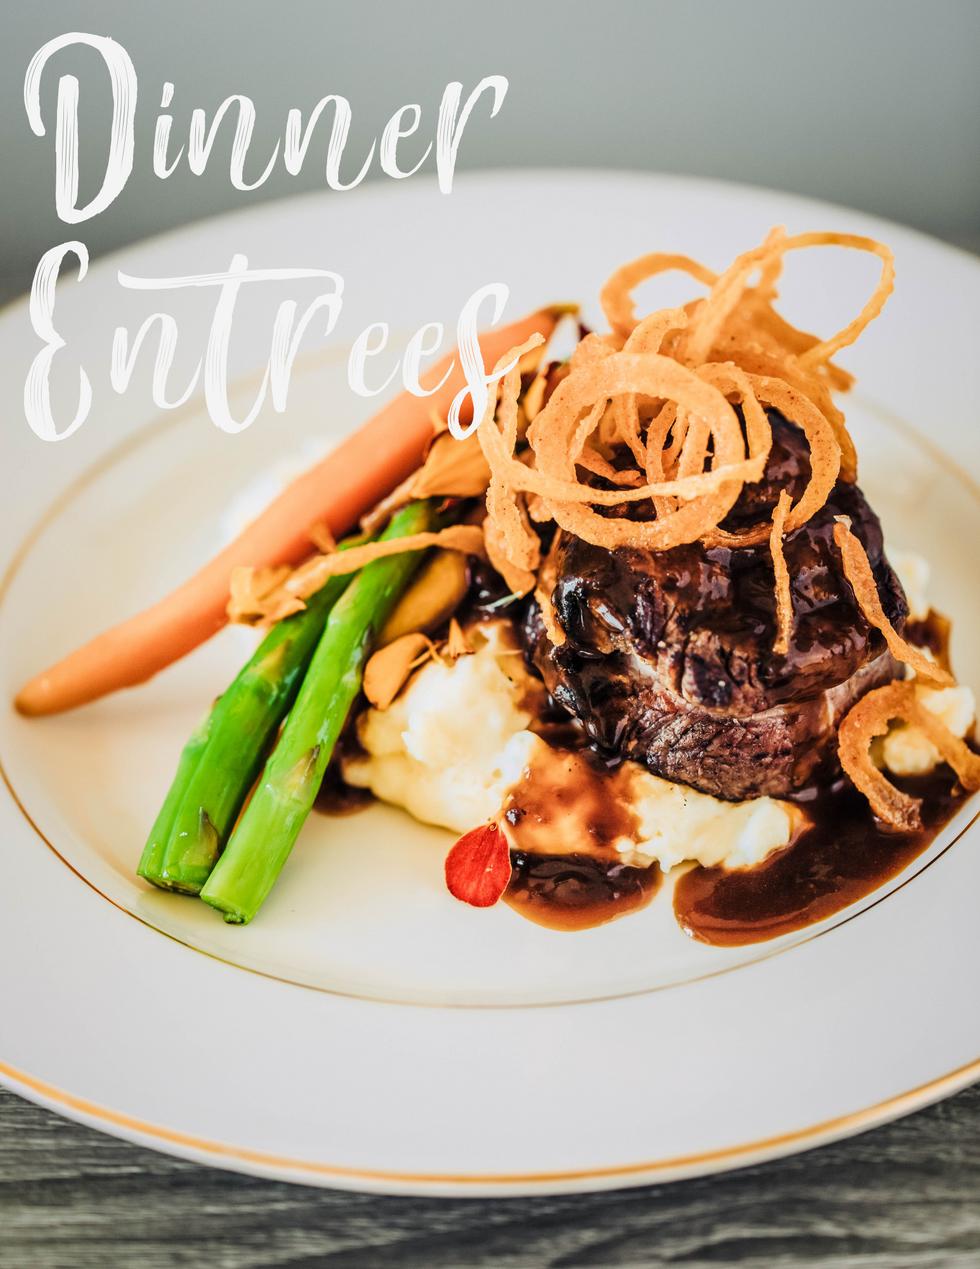 Dinner Entree Cover